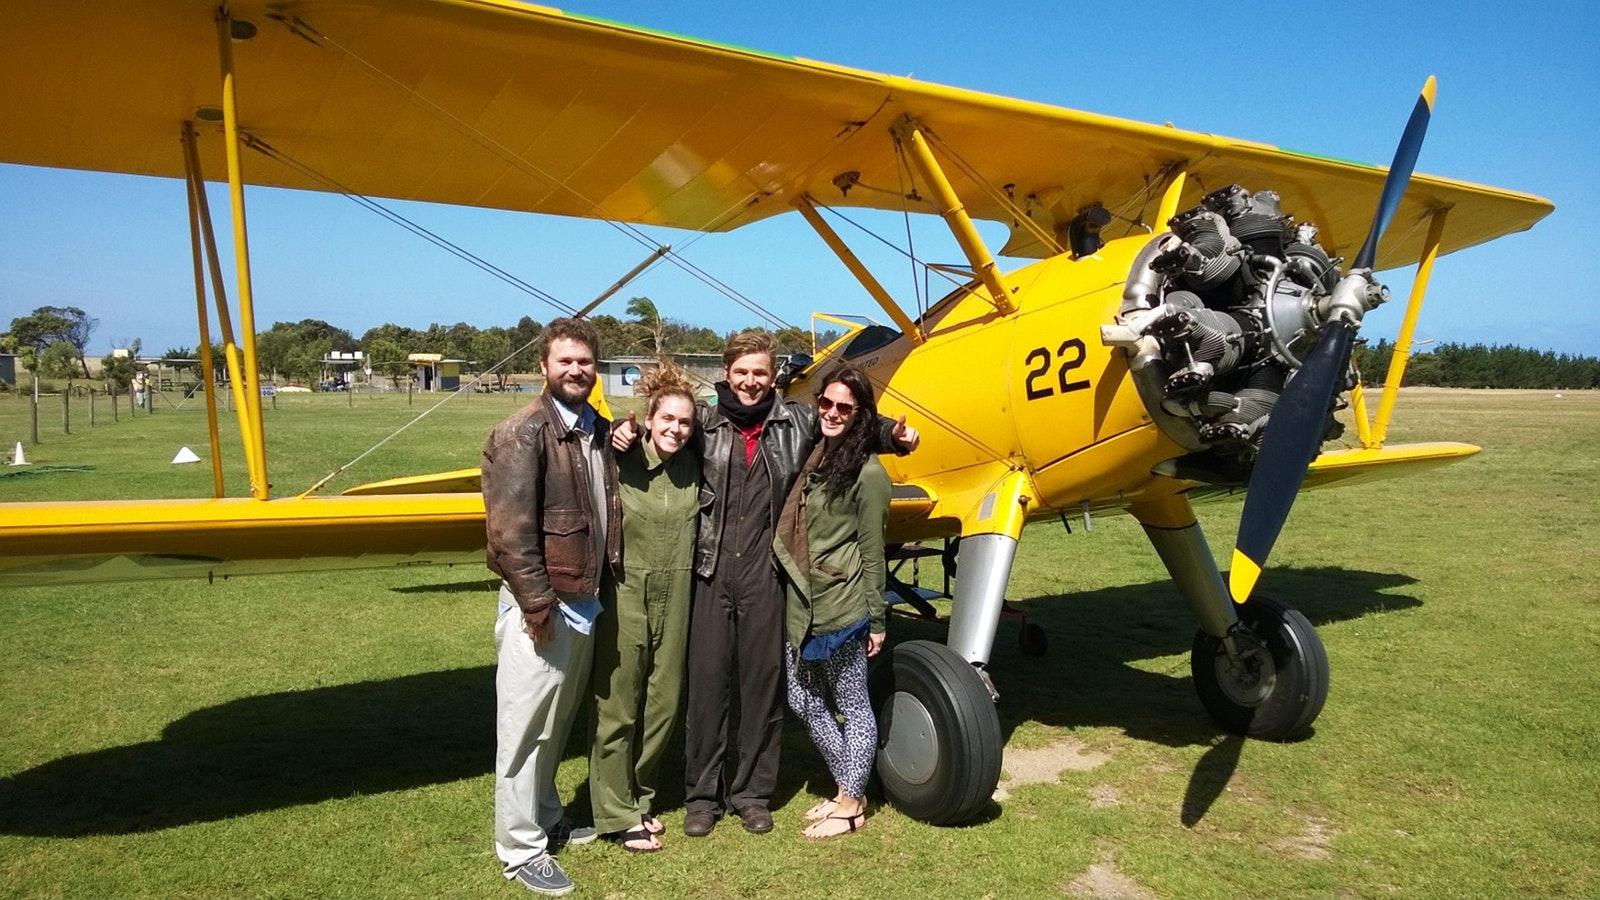 Tiger Moth World customers ready for flight